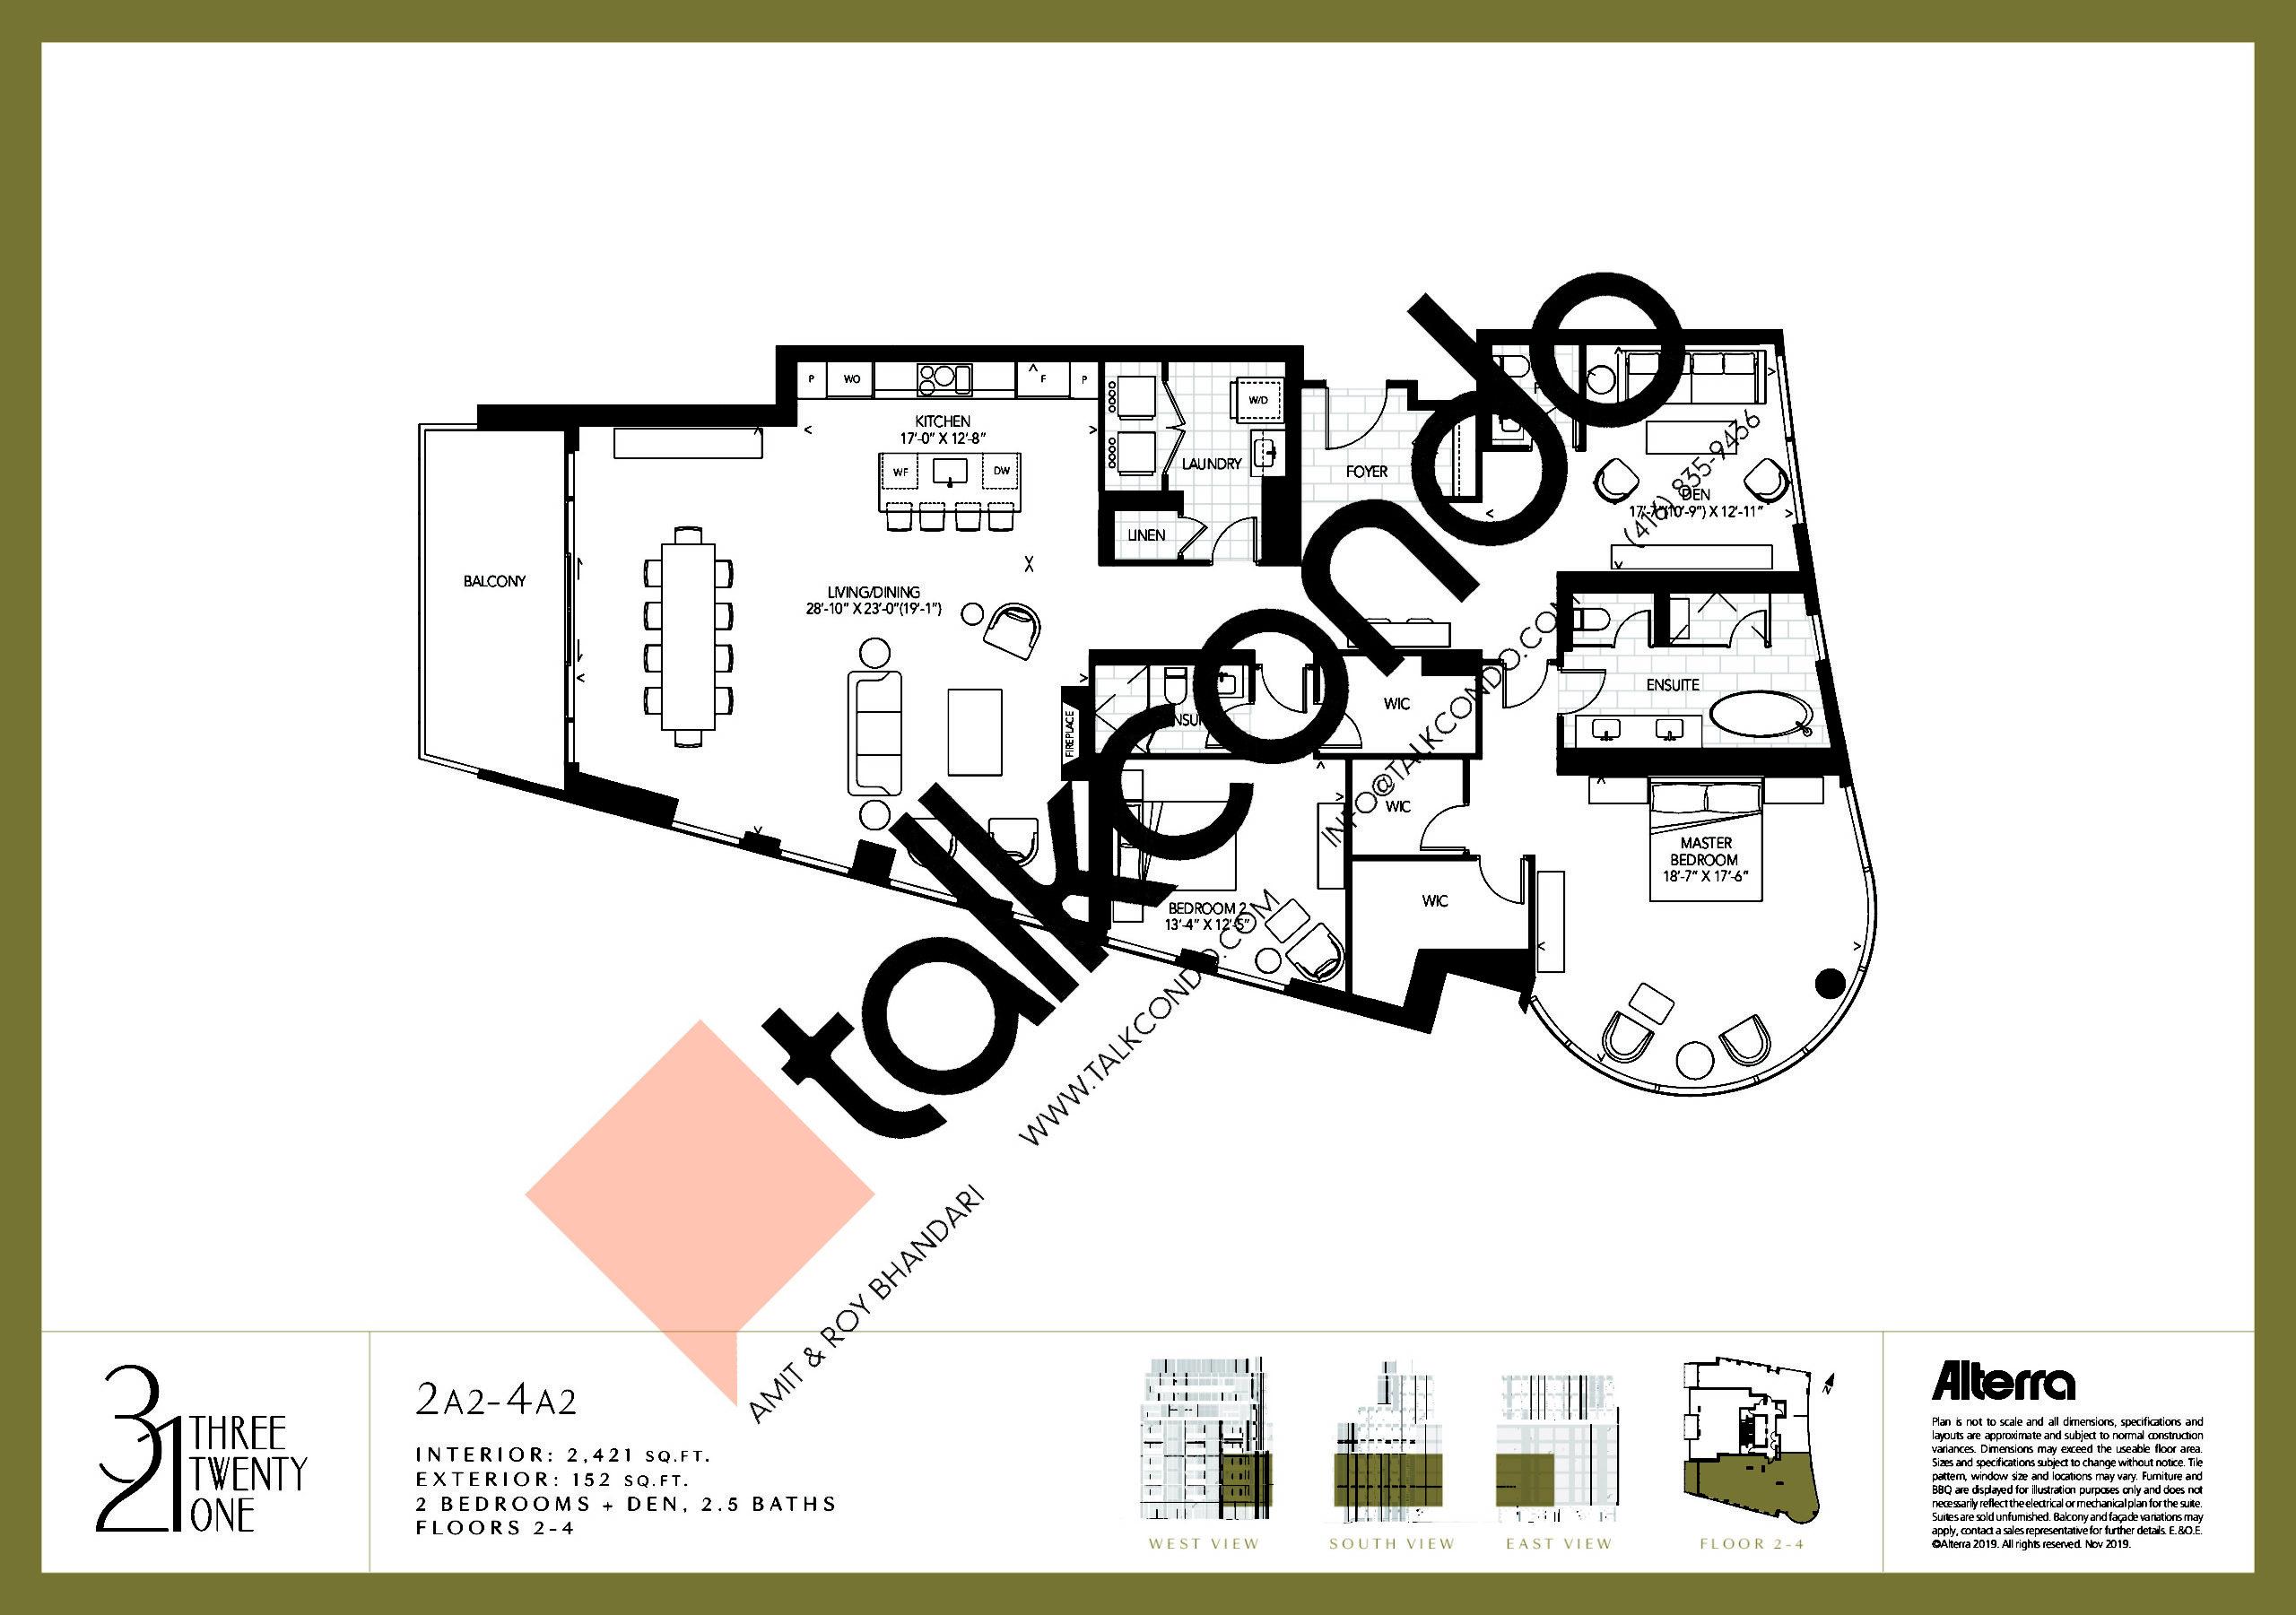 2A2-4A2 Floor Plan at 321 Davenport Condos - 2421 sq.ft